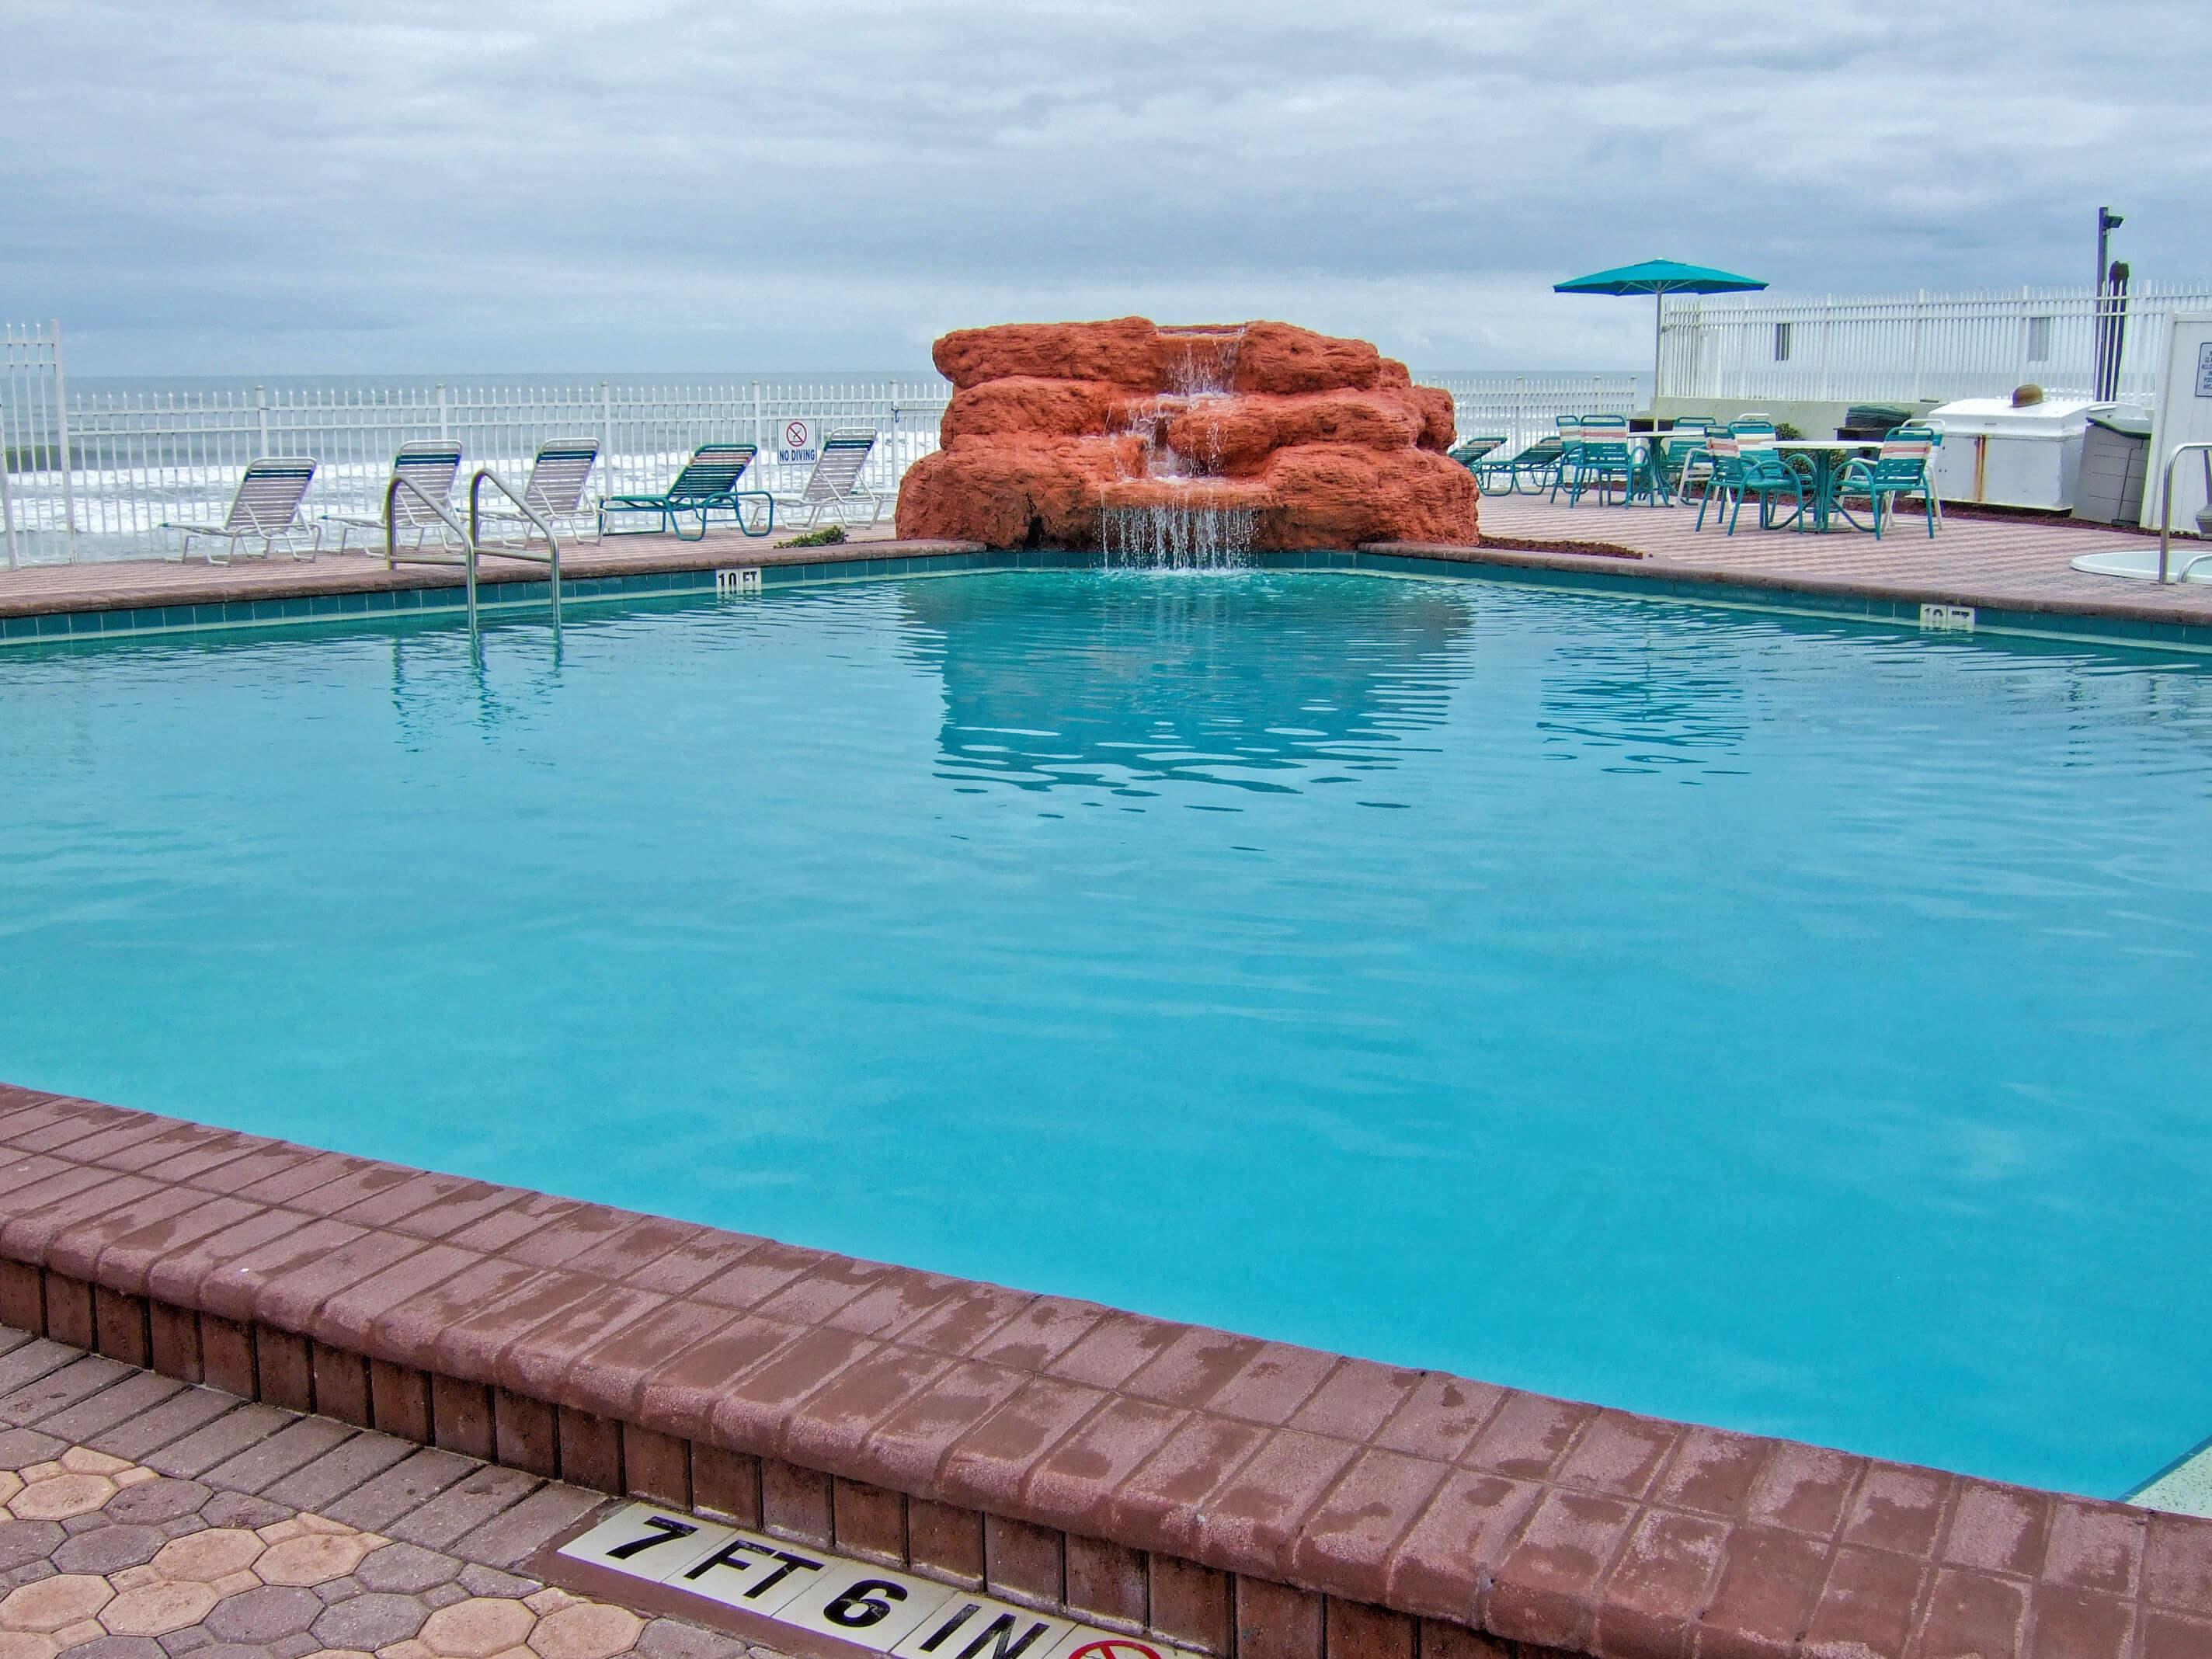 Heated outdoor pool with waterfall overlooking ocean | Harbour Beach Resort | Westgate Resorts in Daytona Beach FL